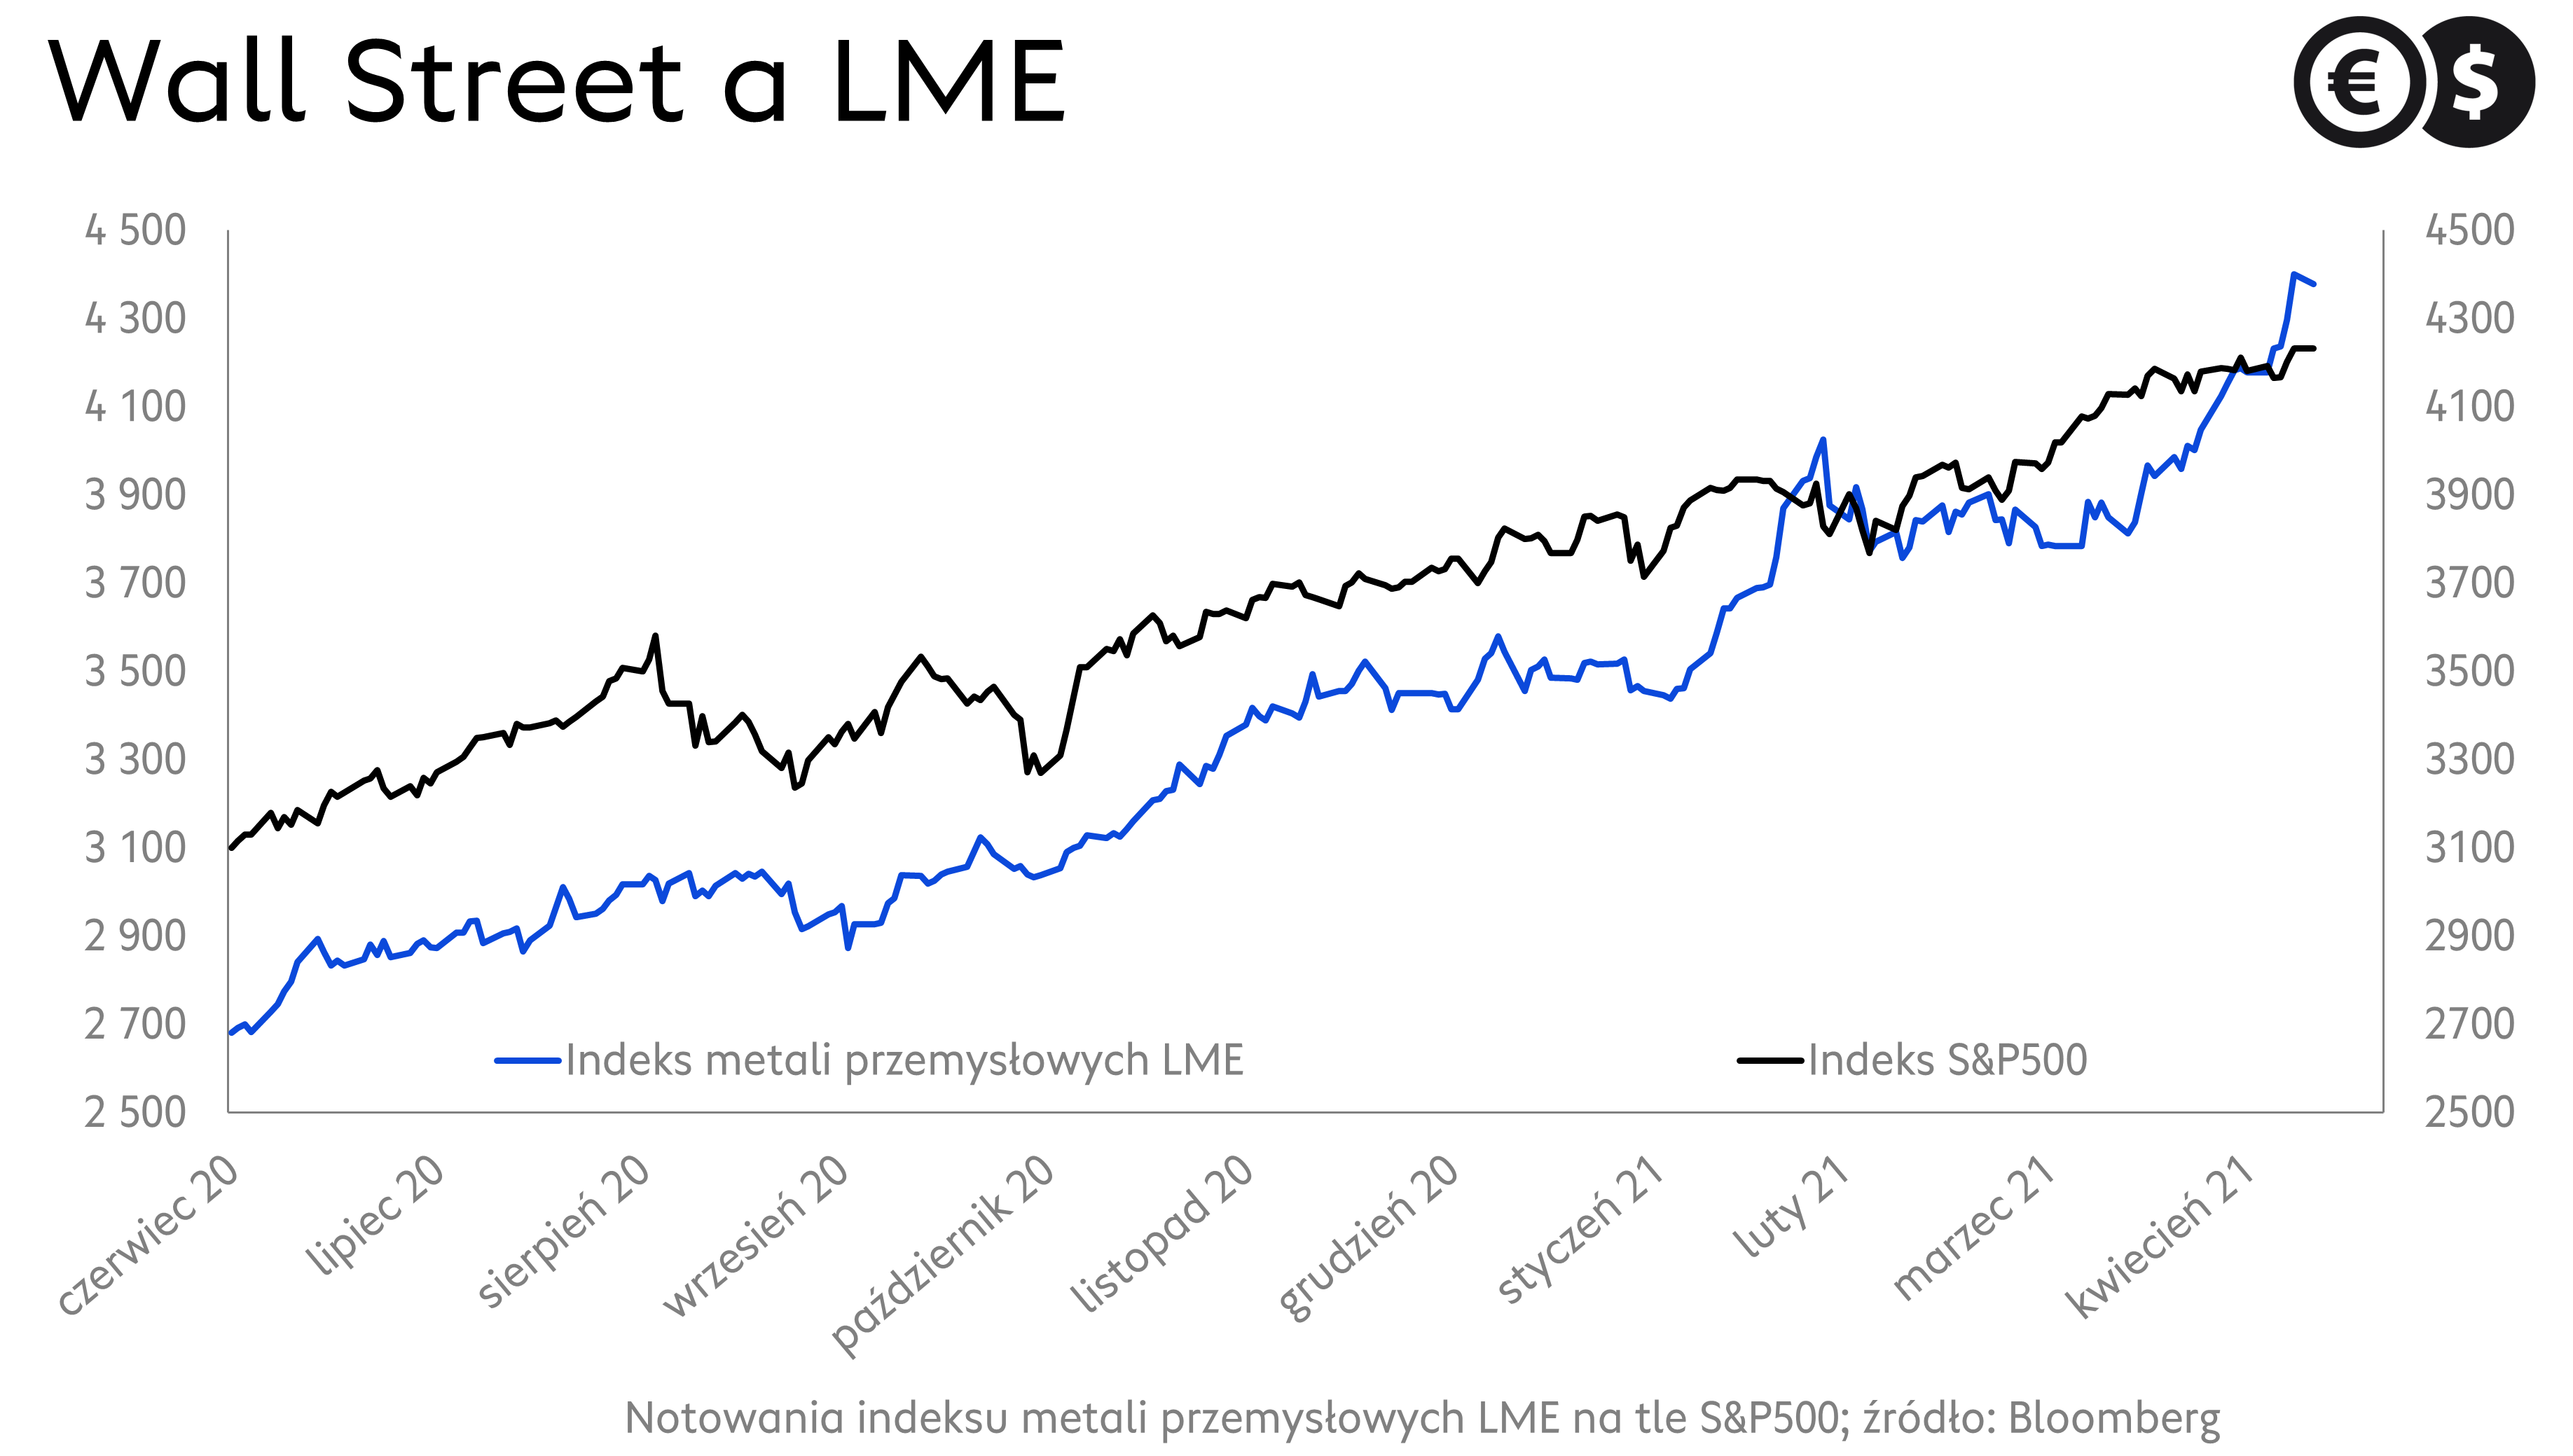 Indeks S&P500 i notowania indeksu metali LME; źródło: Bloomberg